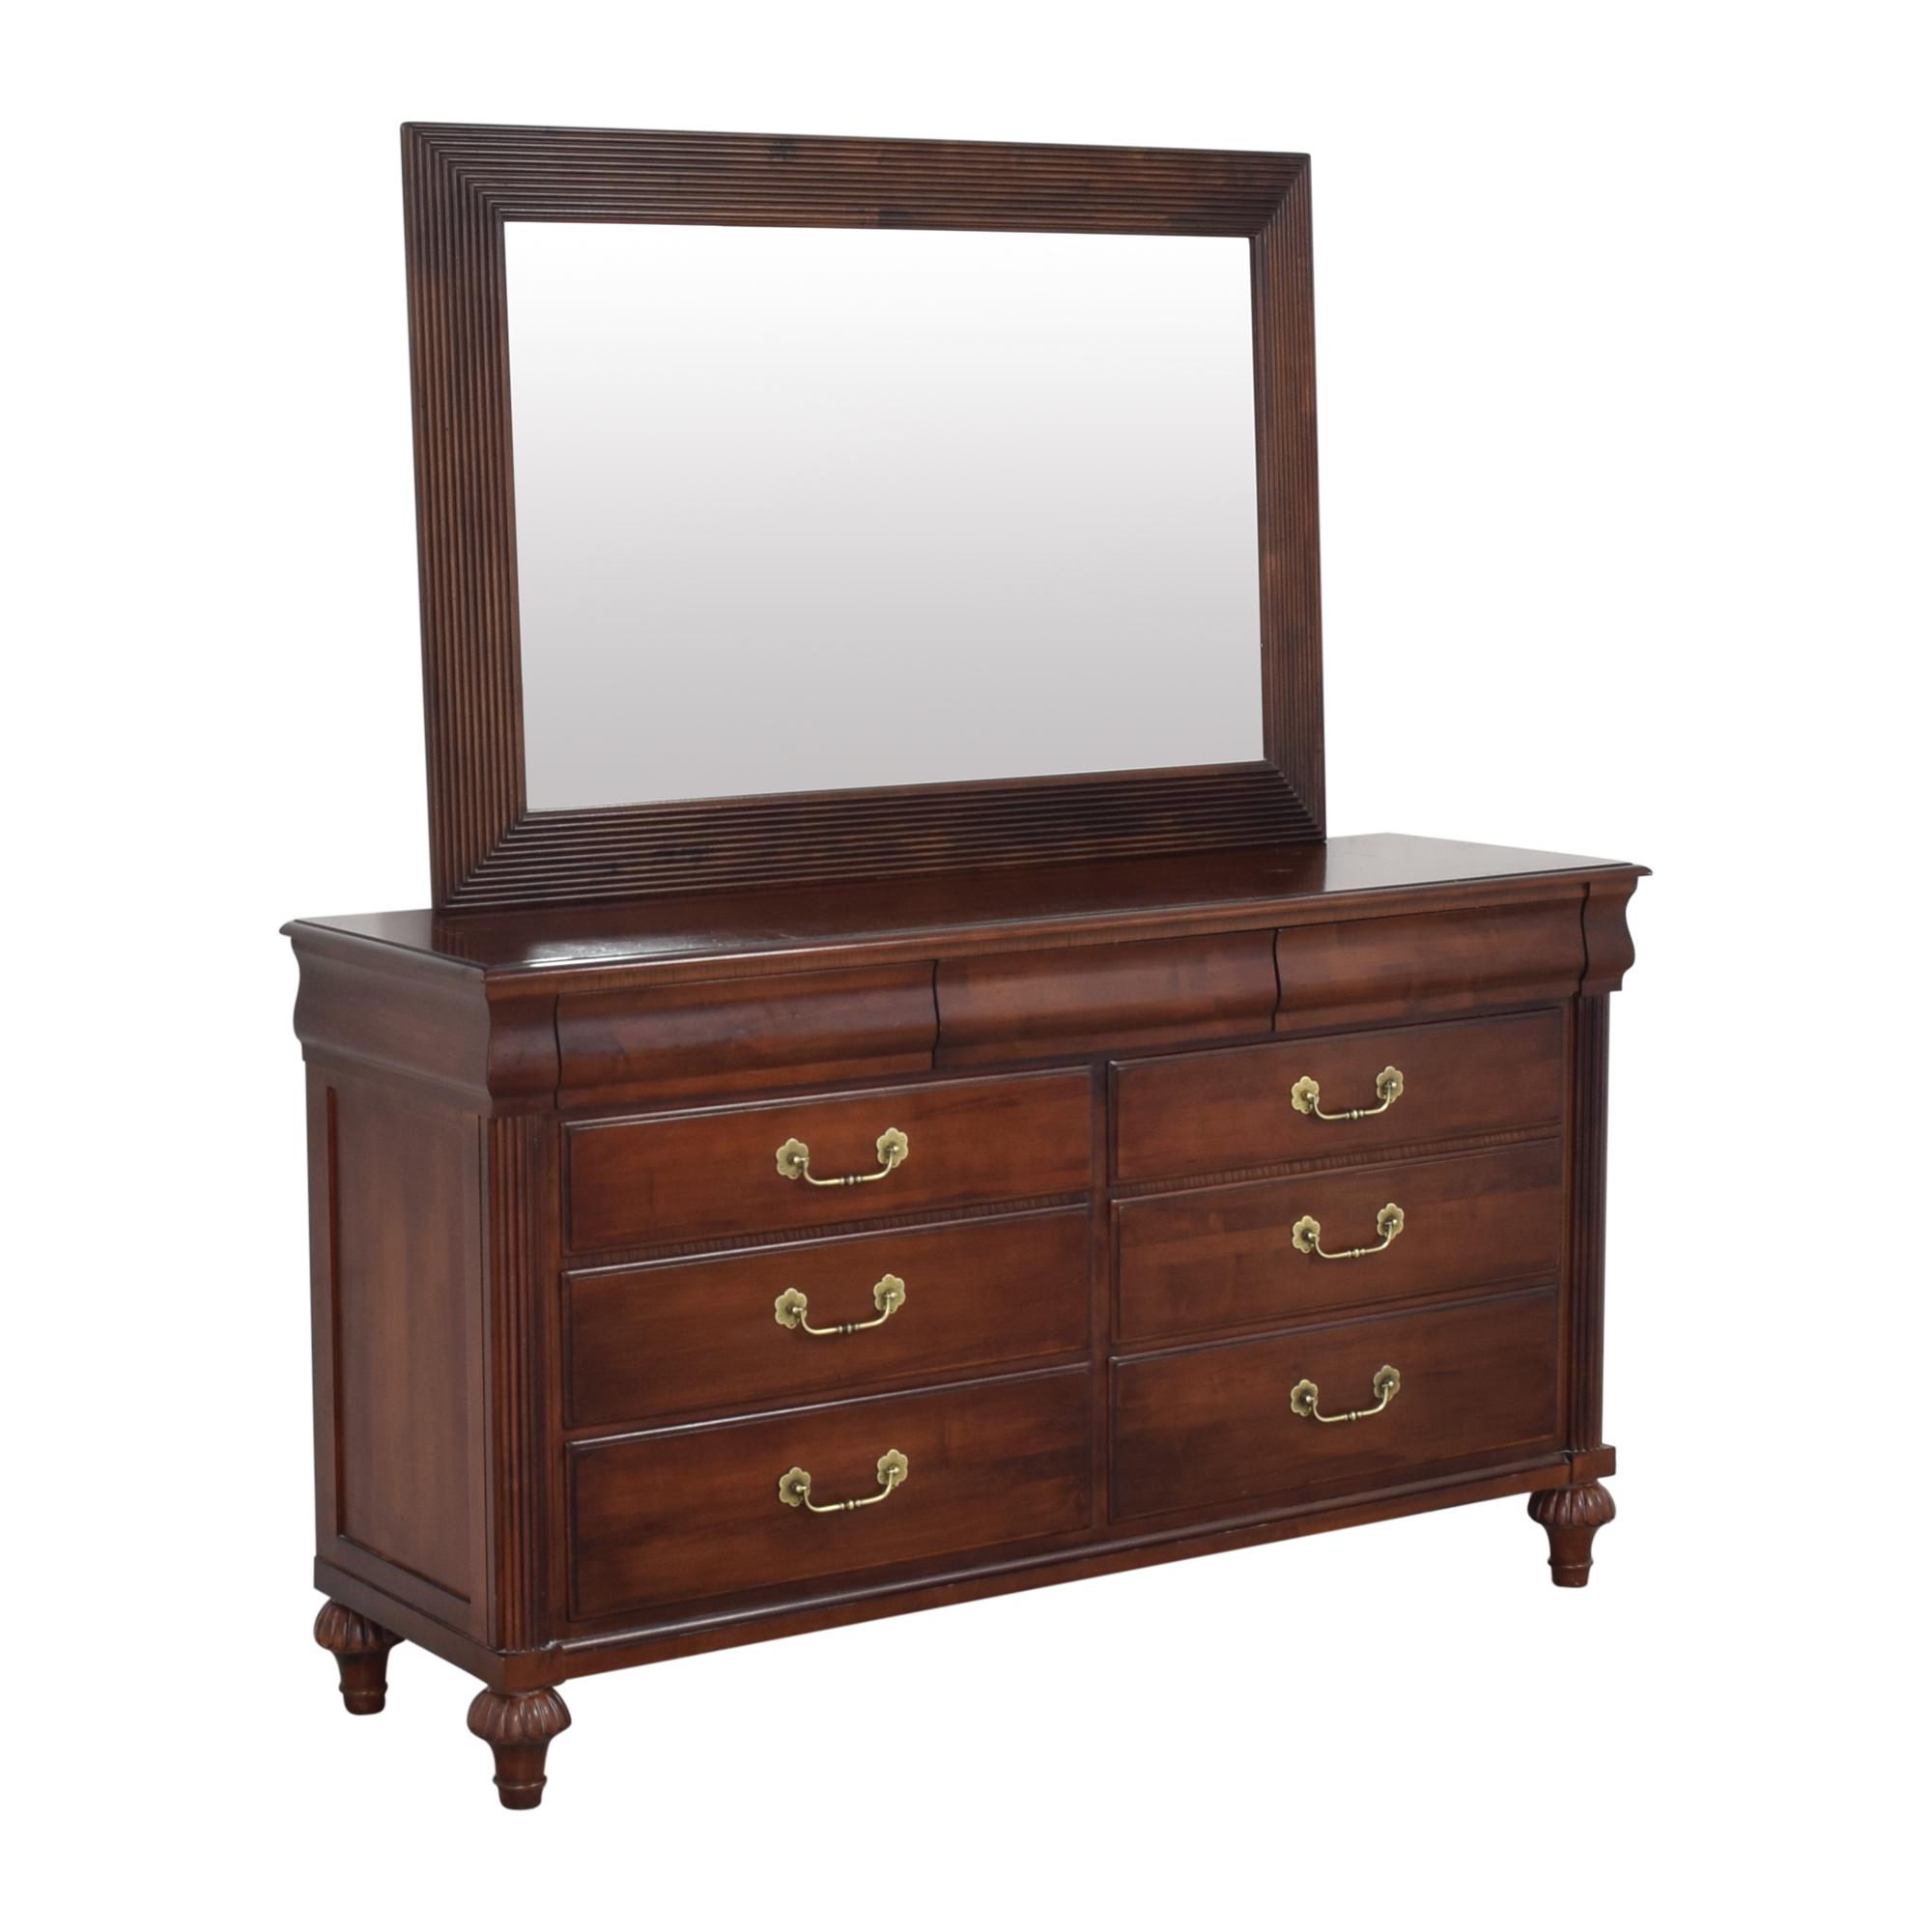 Ethan Allen Ethan Allen British Classics Marques Dresser with Mirror dimensions